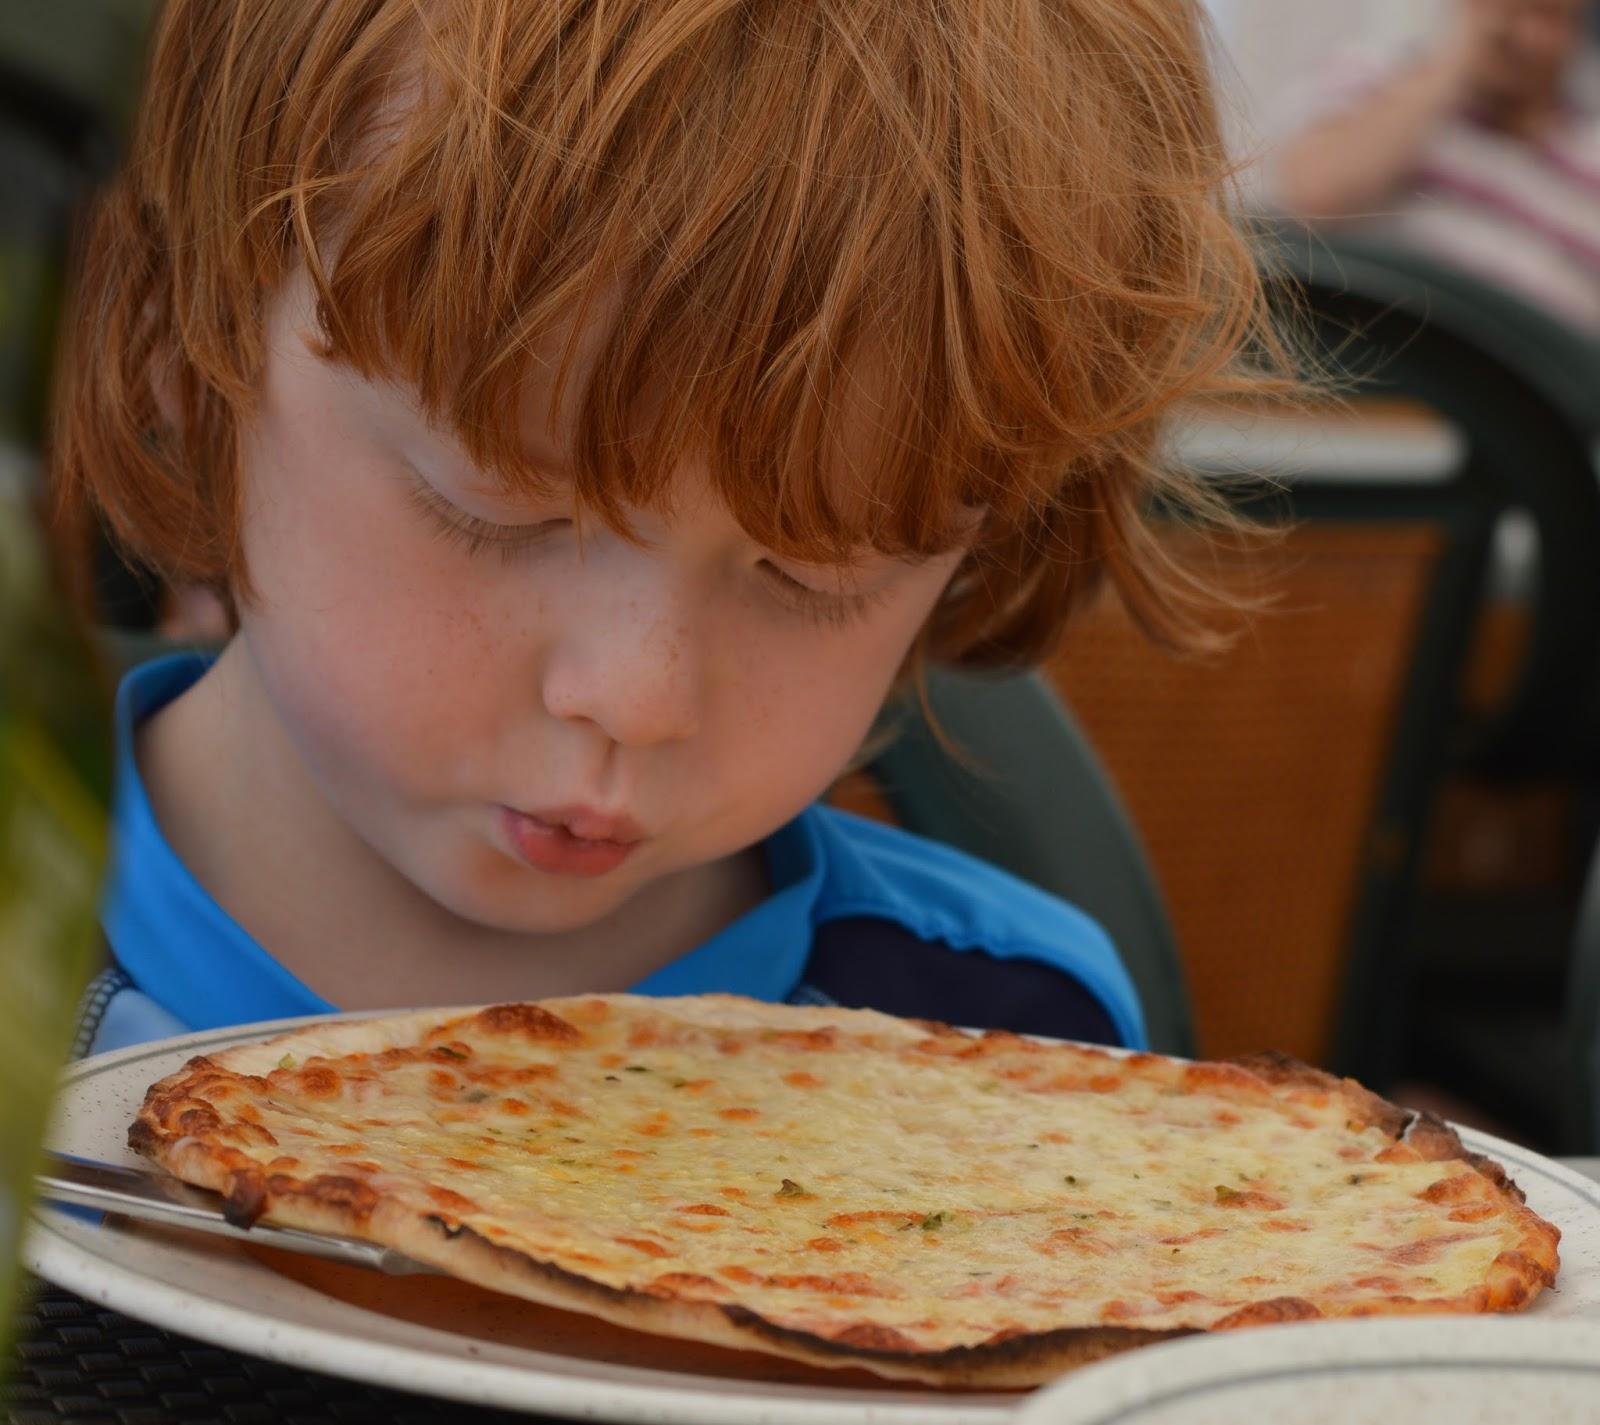 Camping La Siesta, Calella de Palafrugell, Costa Brava - a review - kids pizza